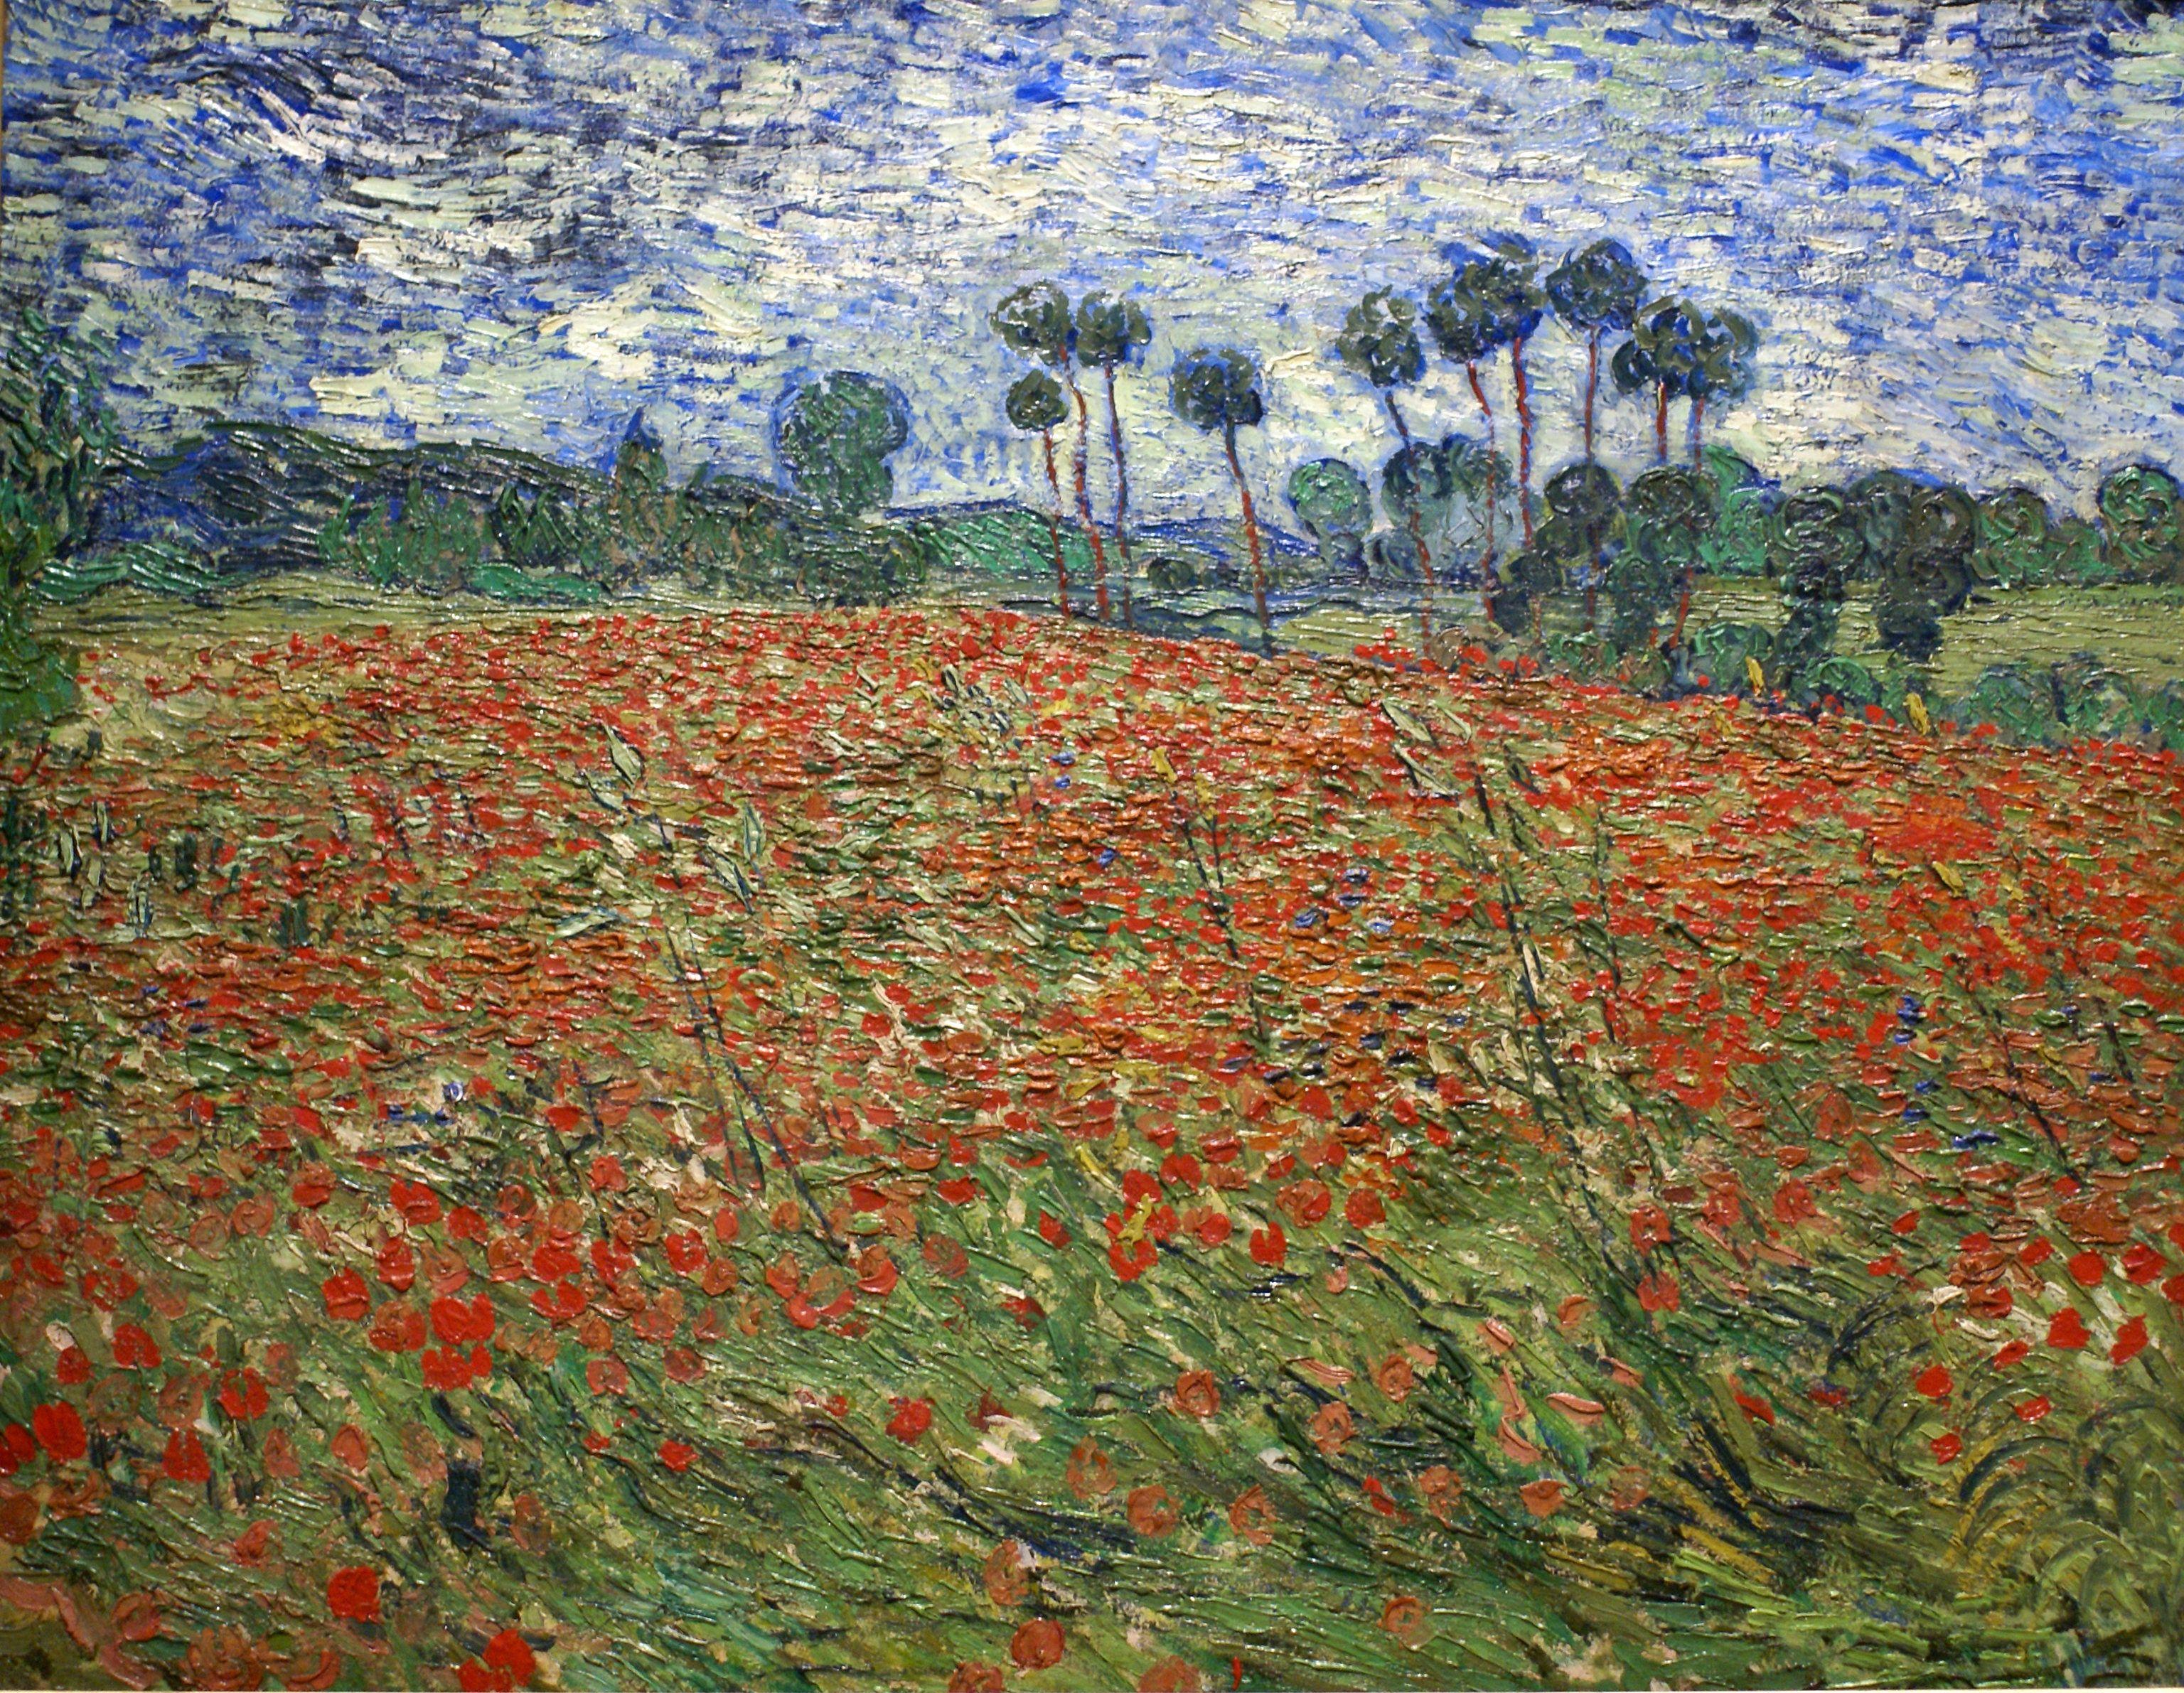 Vincent Van Gogh Mohnblumenfeld Poppy Field Avec Images Art De Van Gogh